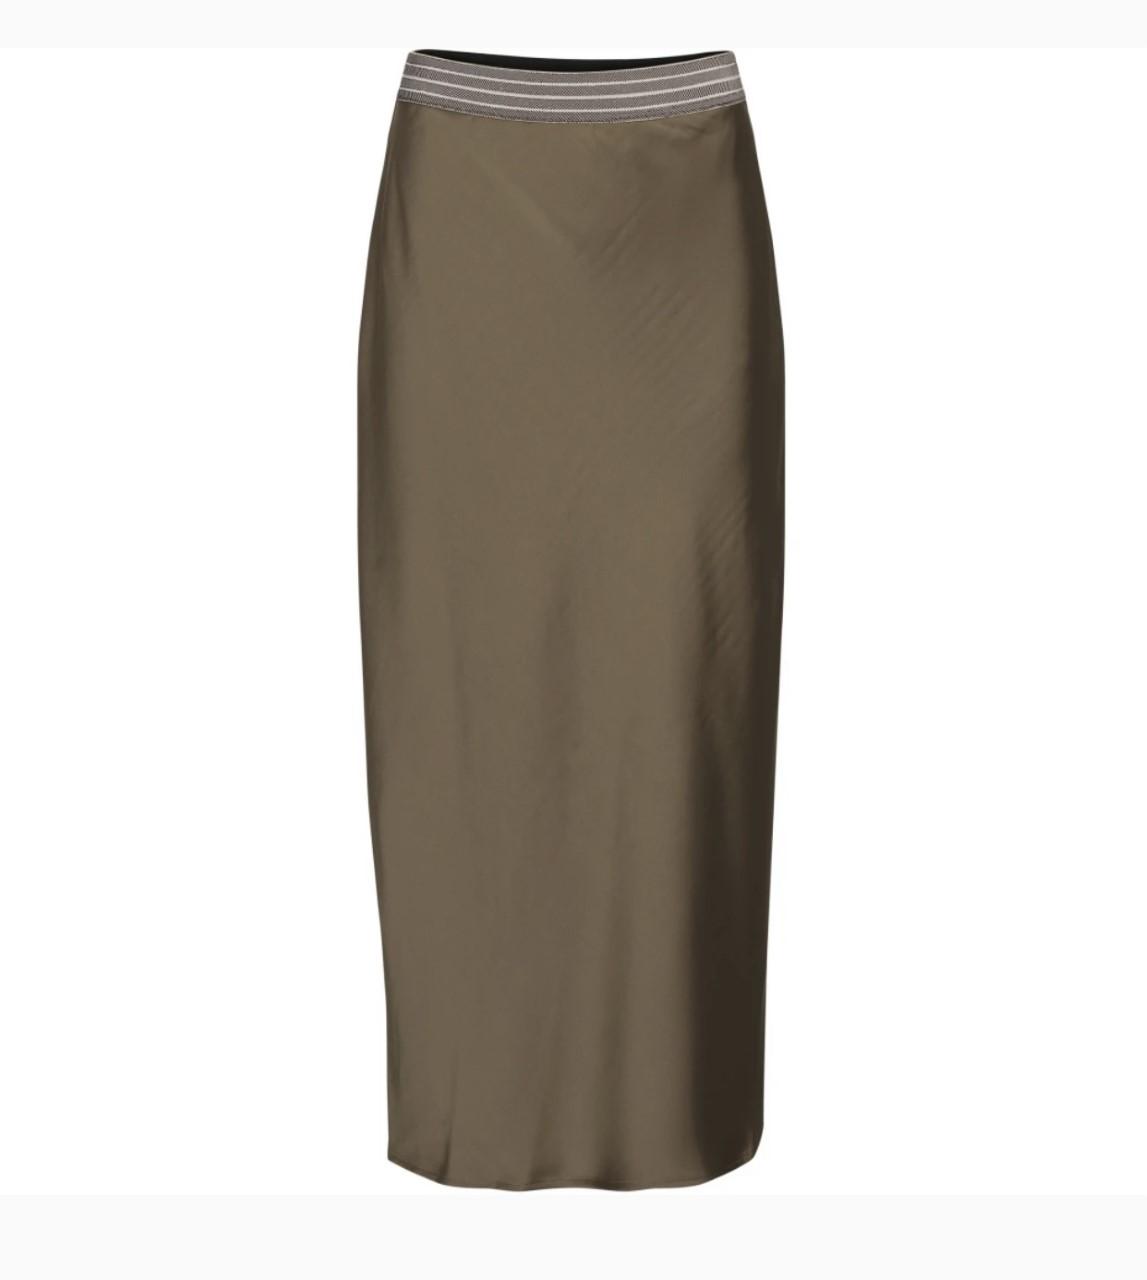 CostaMani Fulla skirt